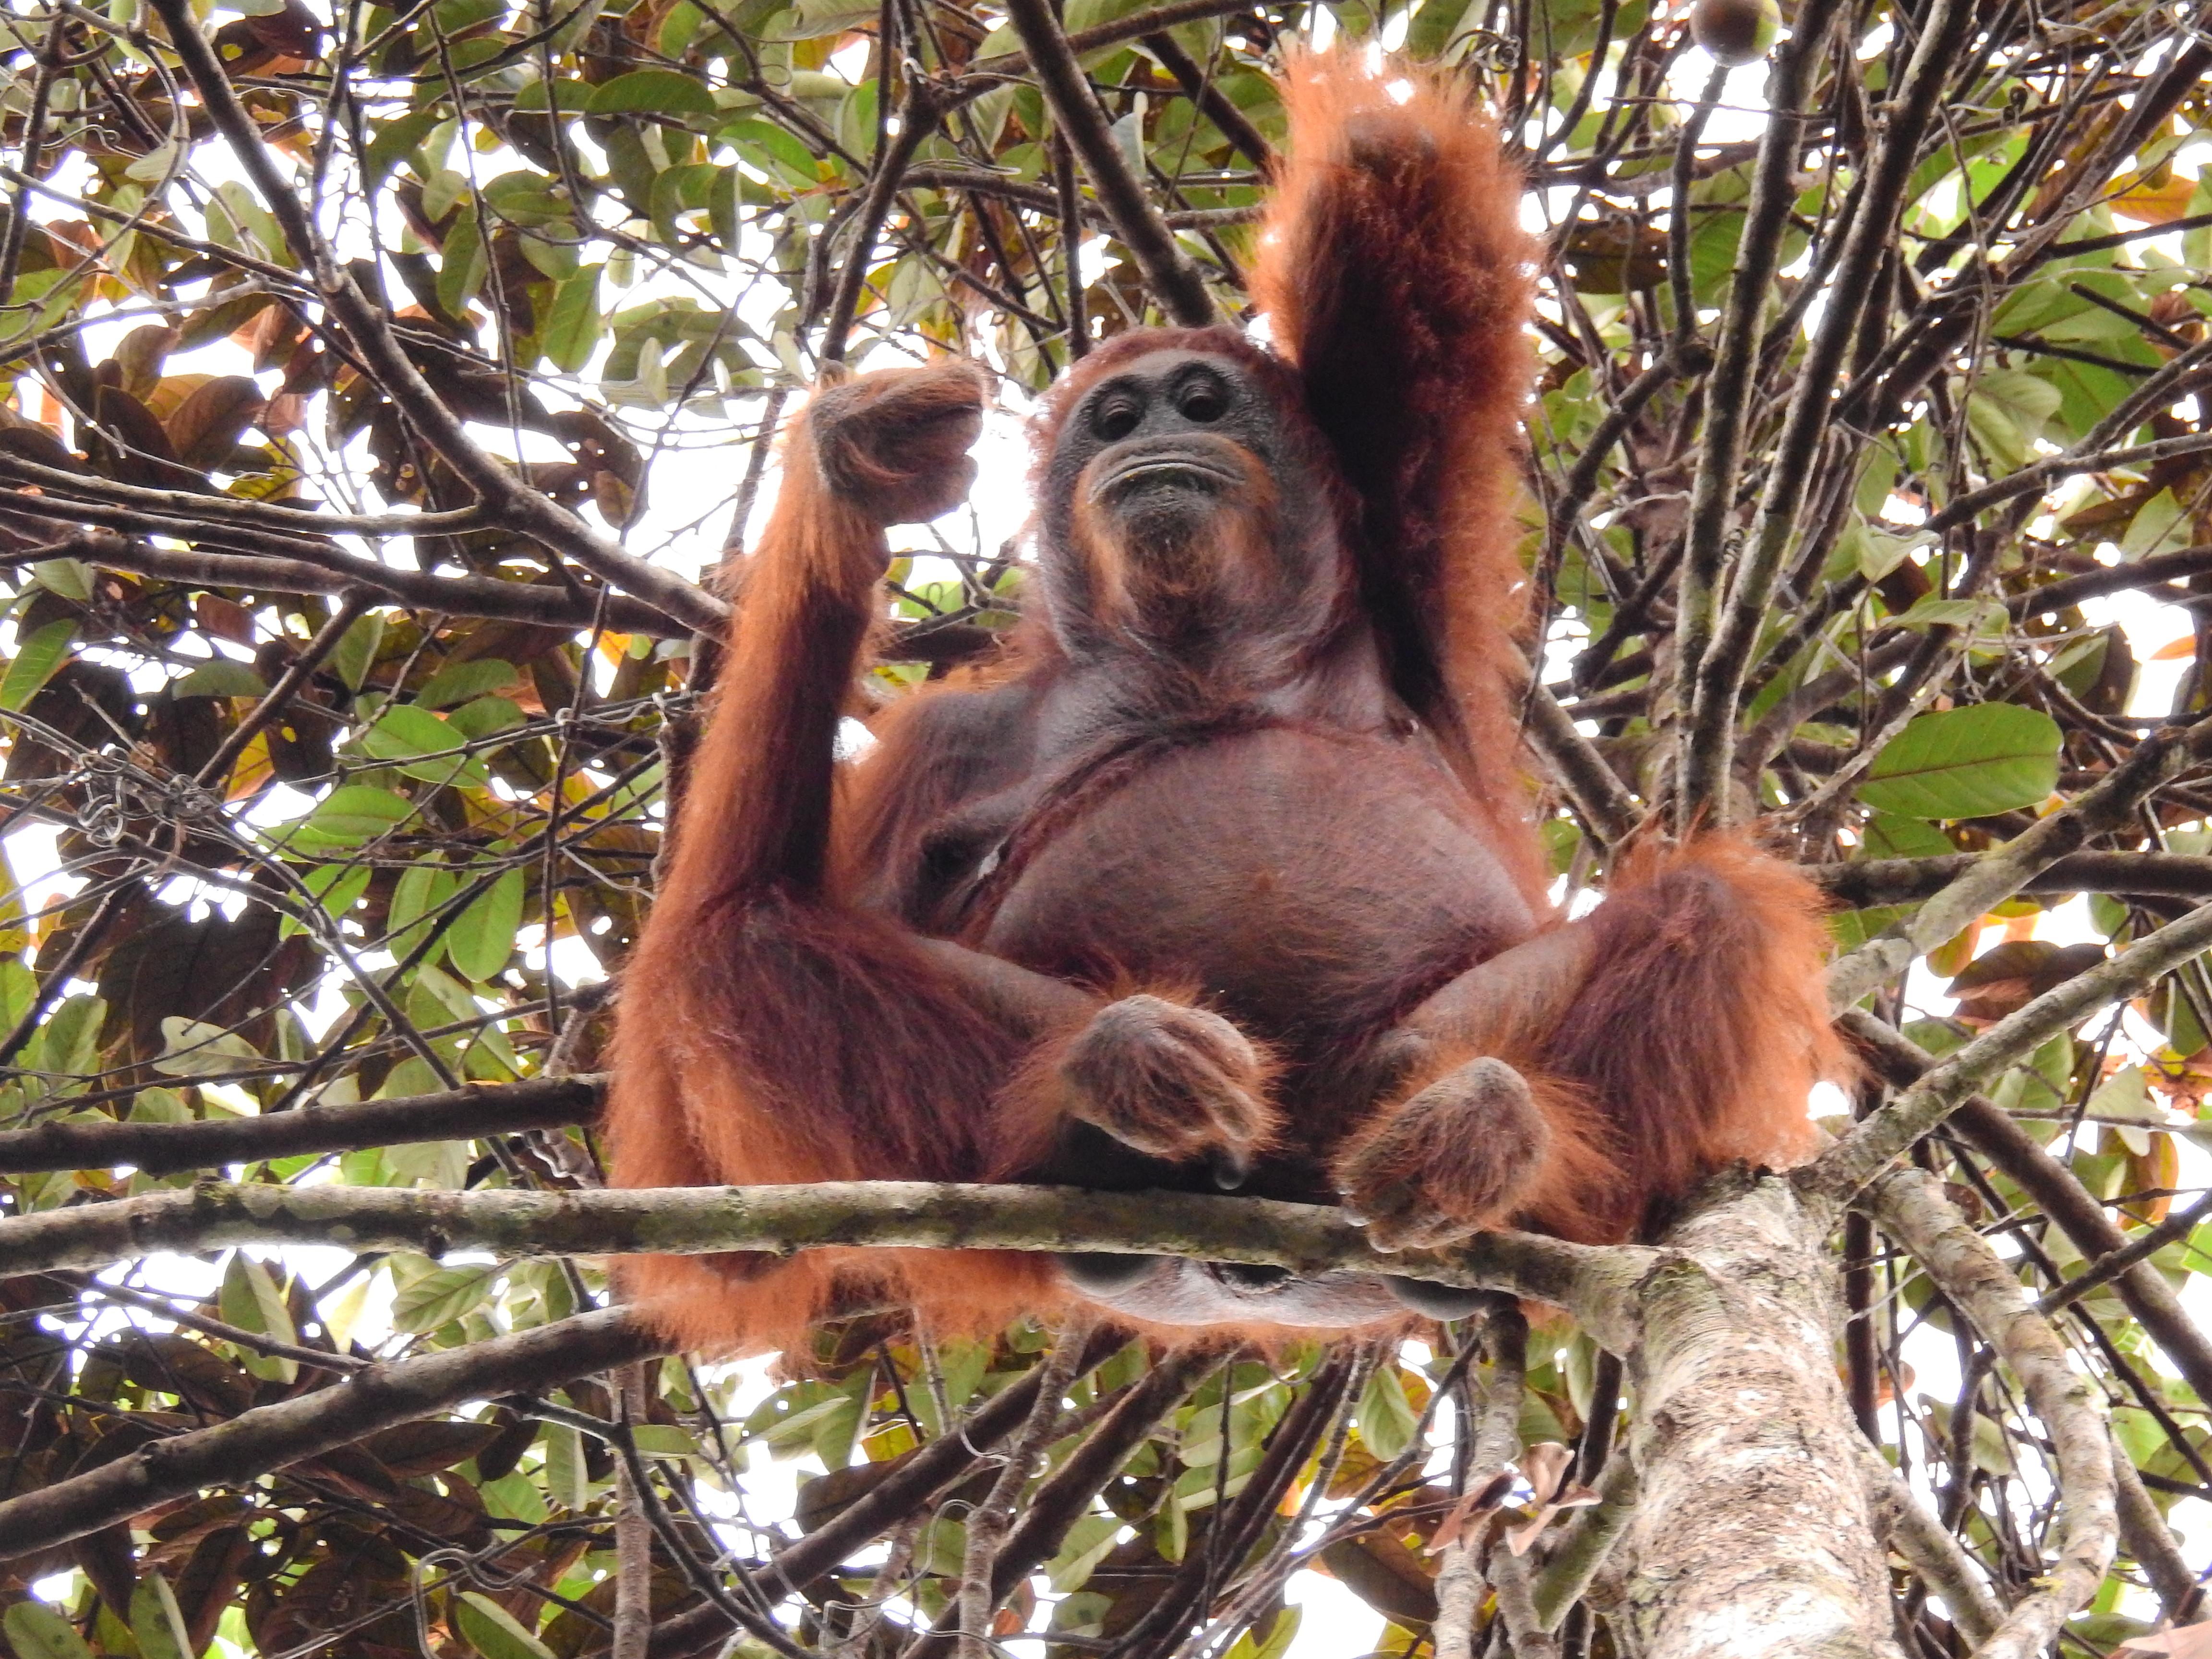 Effectively saving Kalimantan's orangutan | WWF